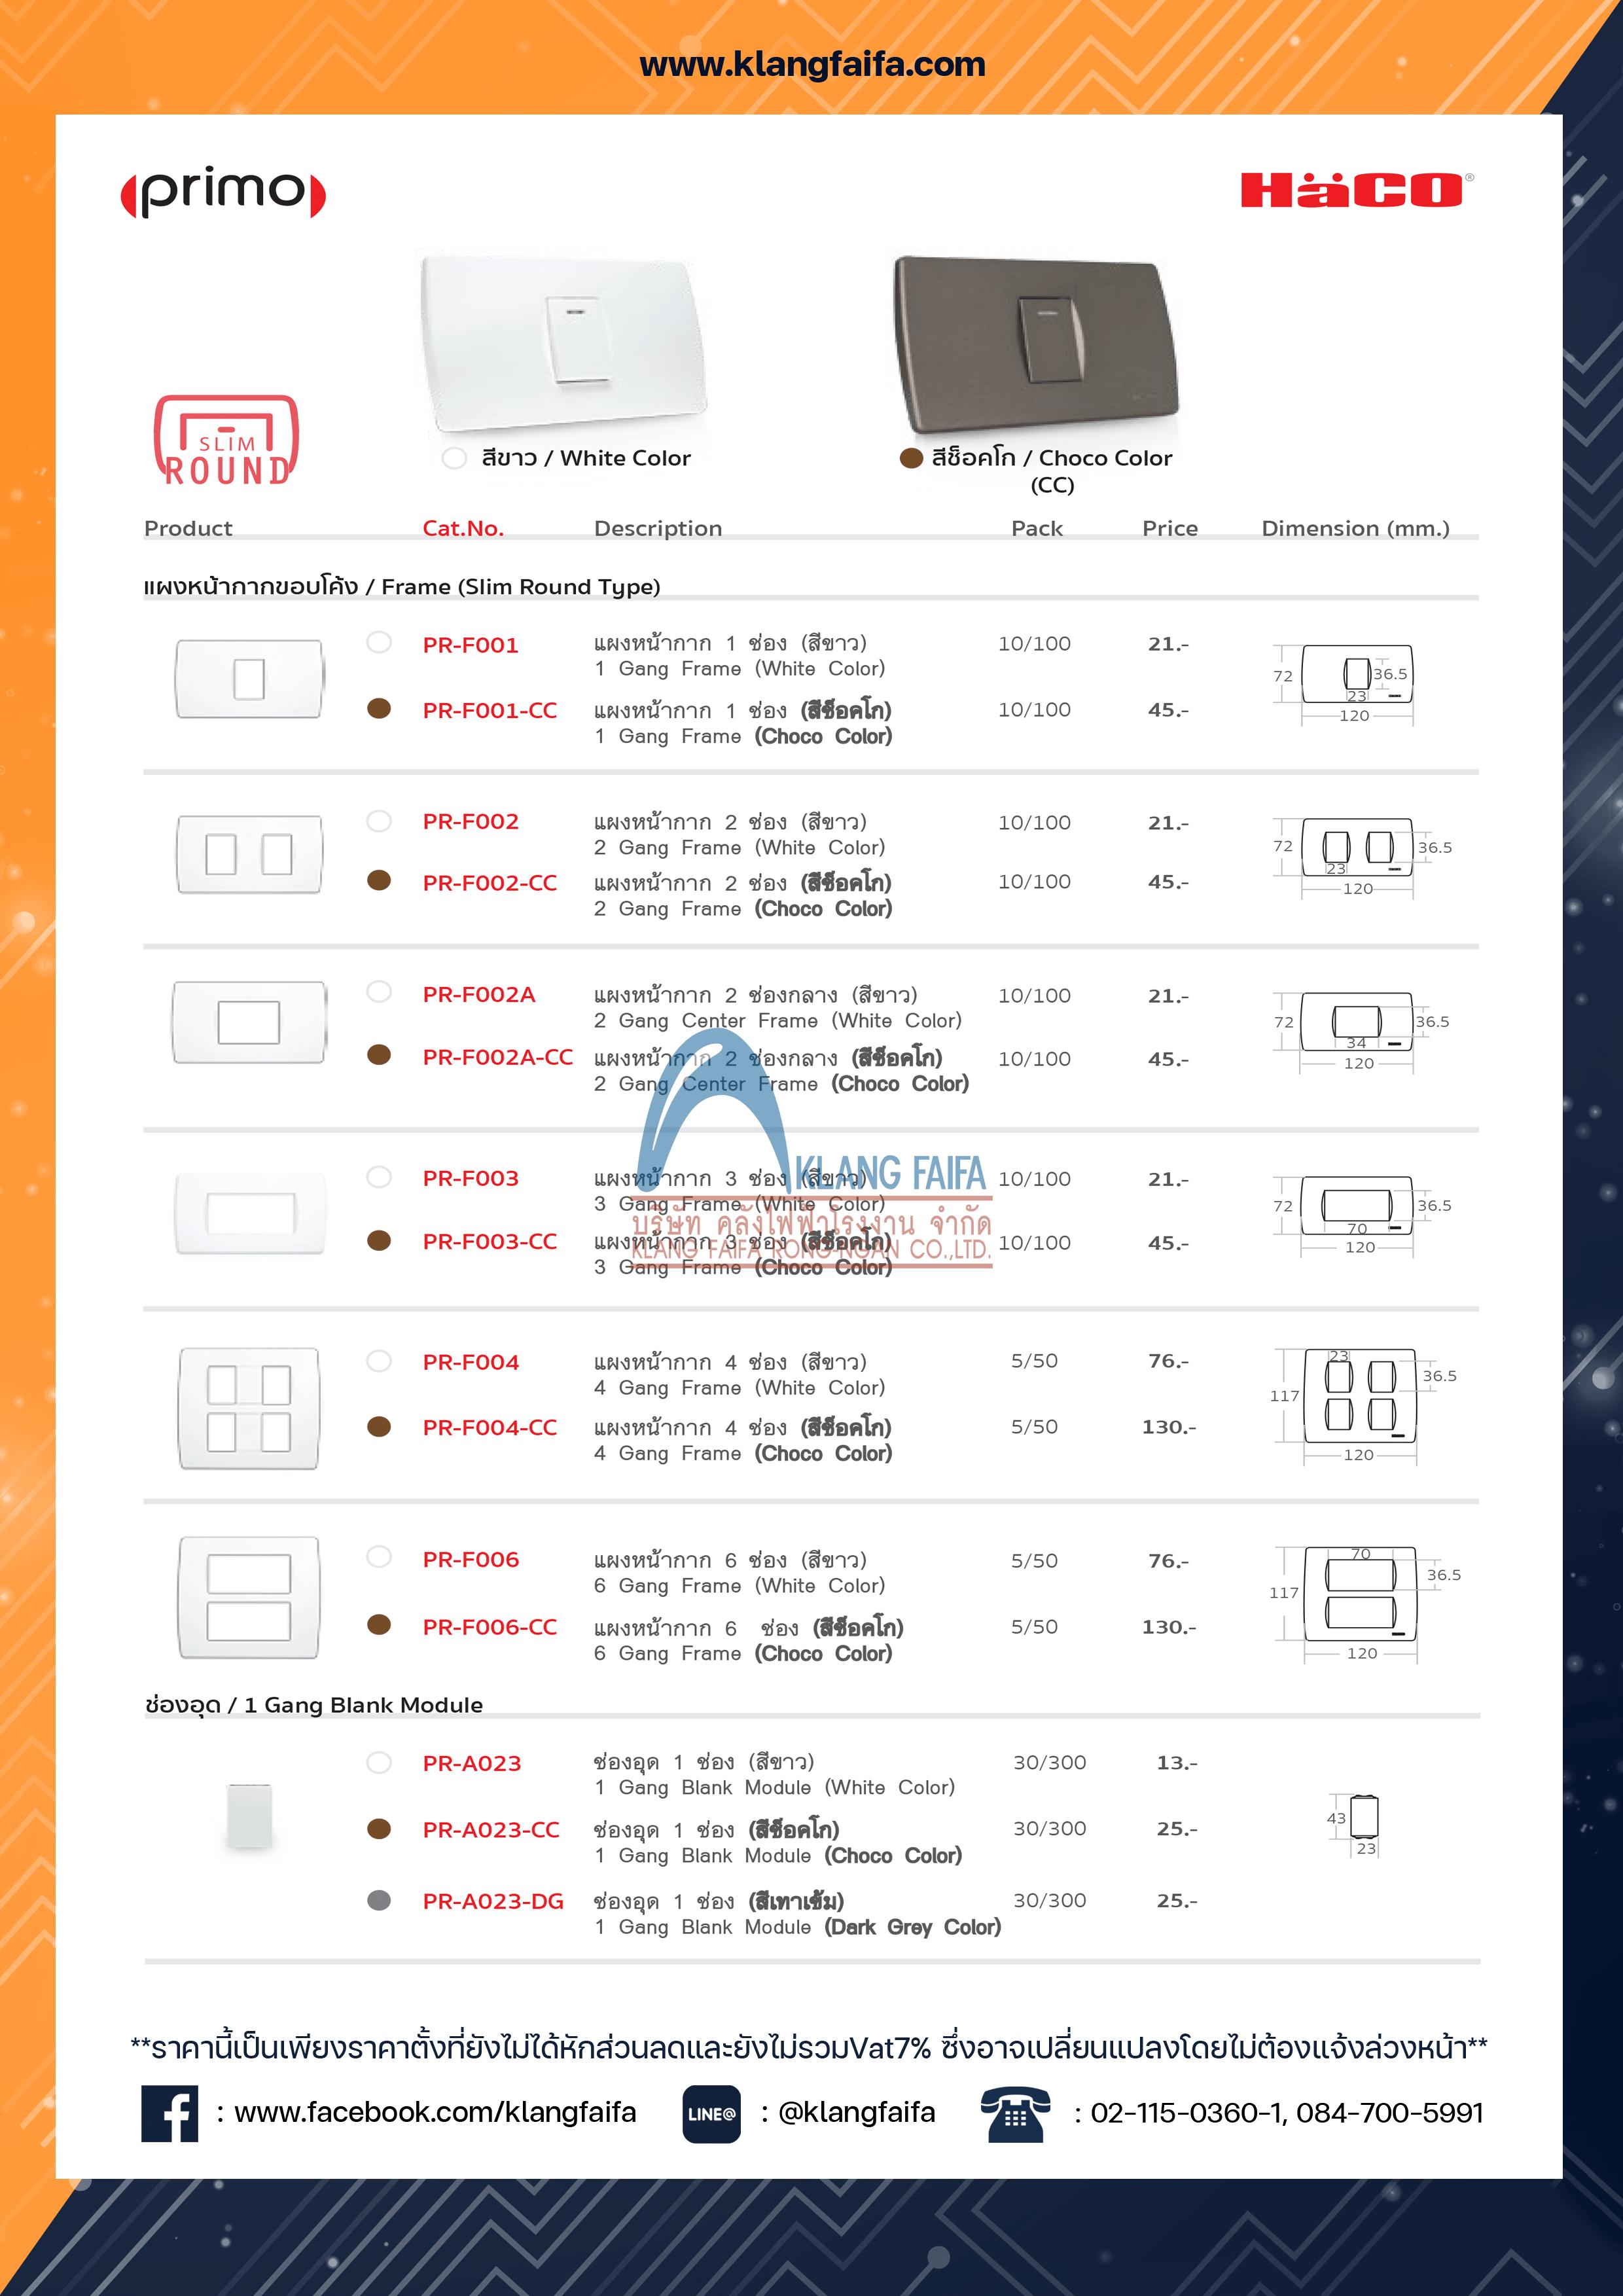 Haco, ฮาโก้,  Primo, พรีโม, Floor Outlets, Convenient Floor Wall&lamp; Table Sockets, เต้ารับฝังพื้น,